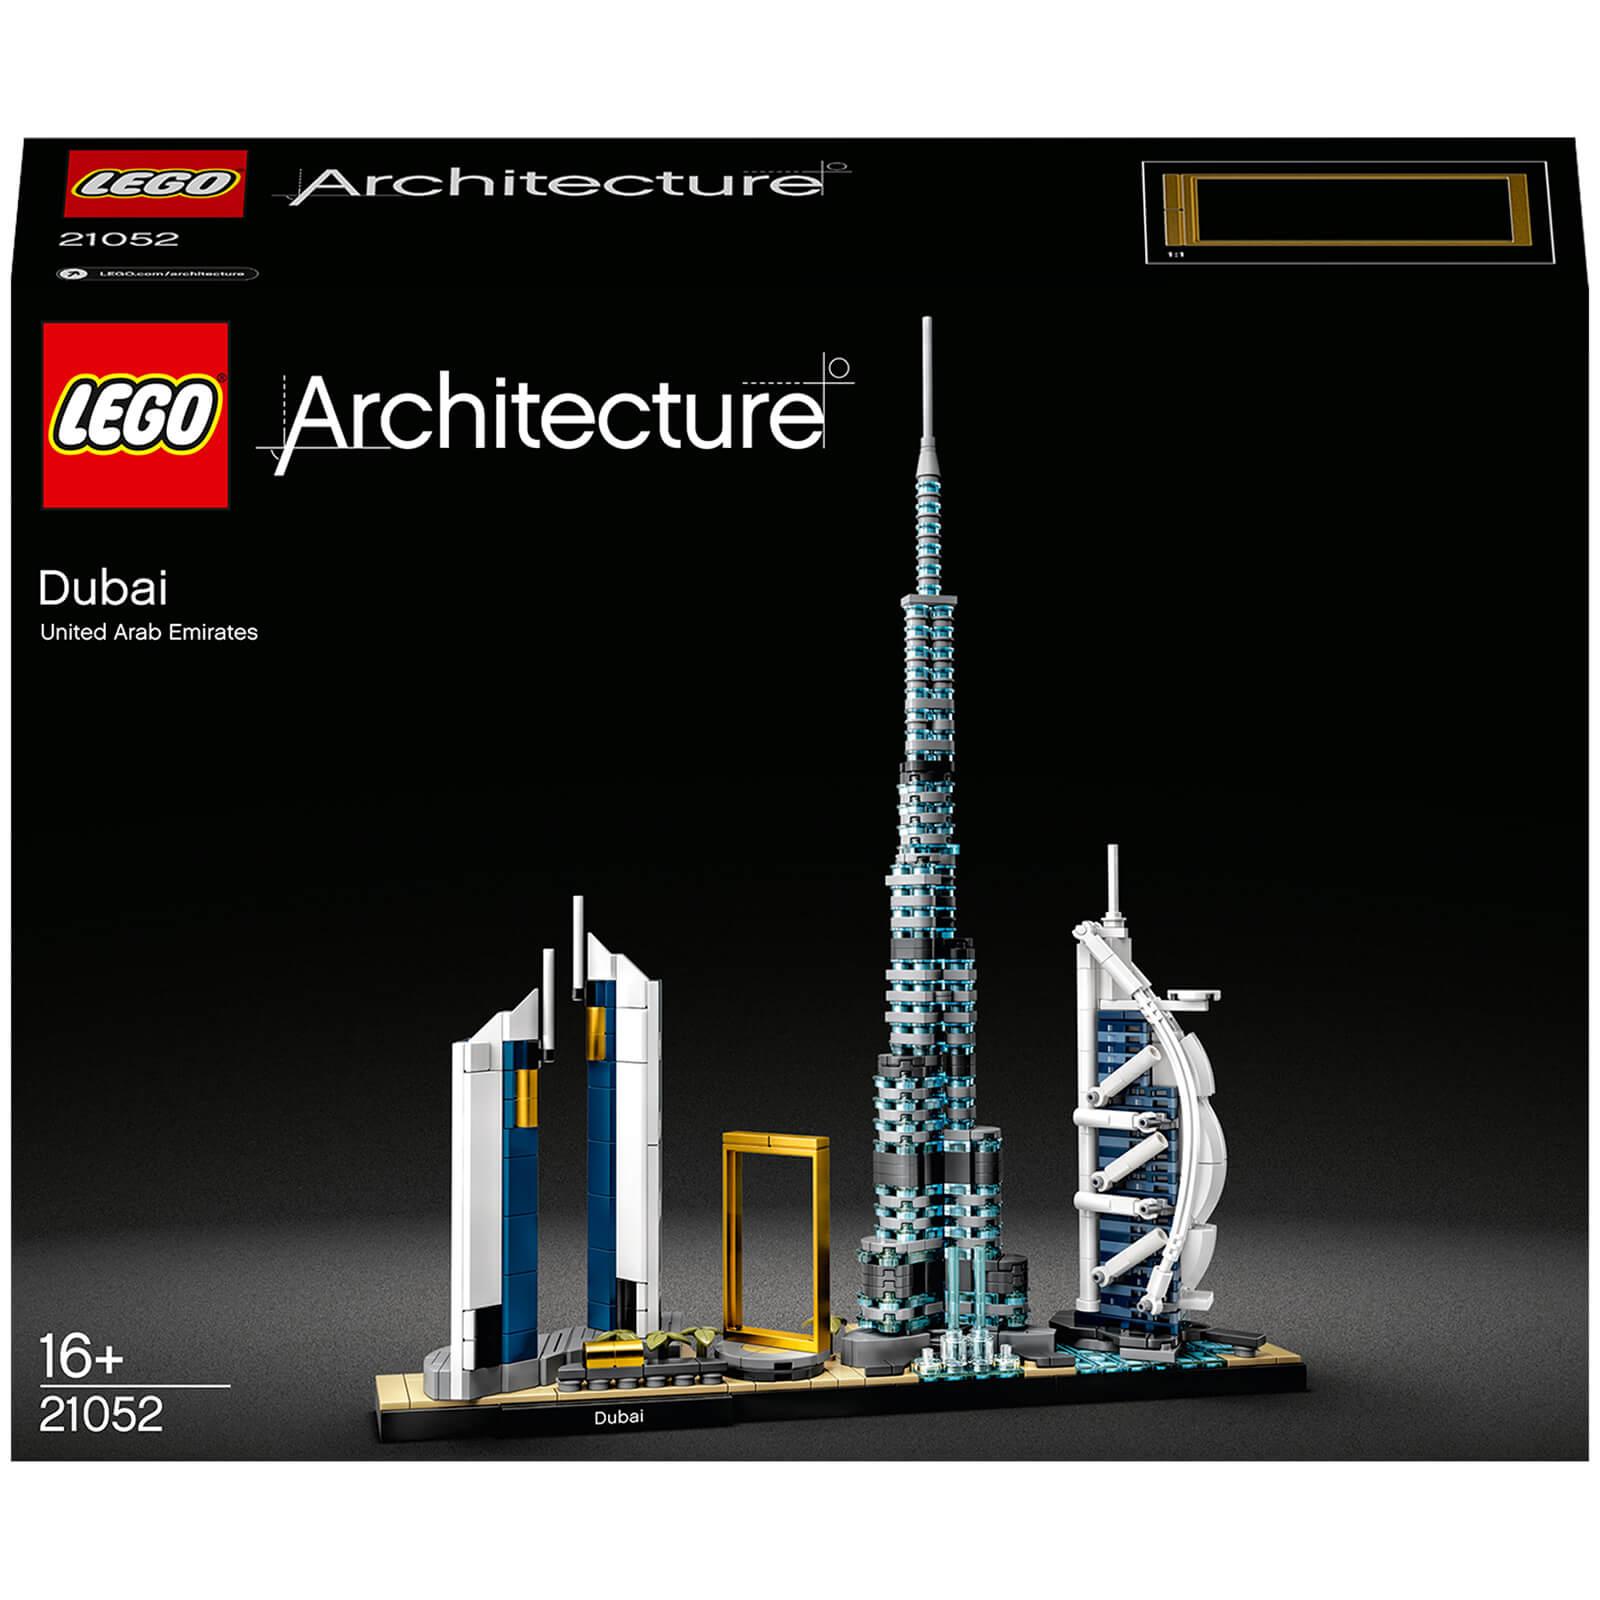 Image of 21052 LEGO® ARCHITECTURE Dubai